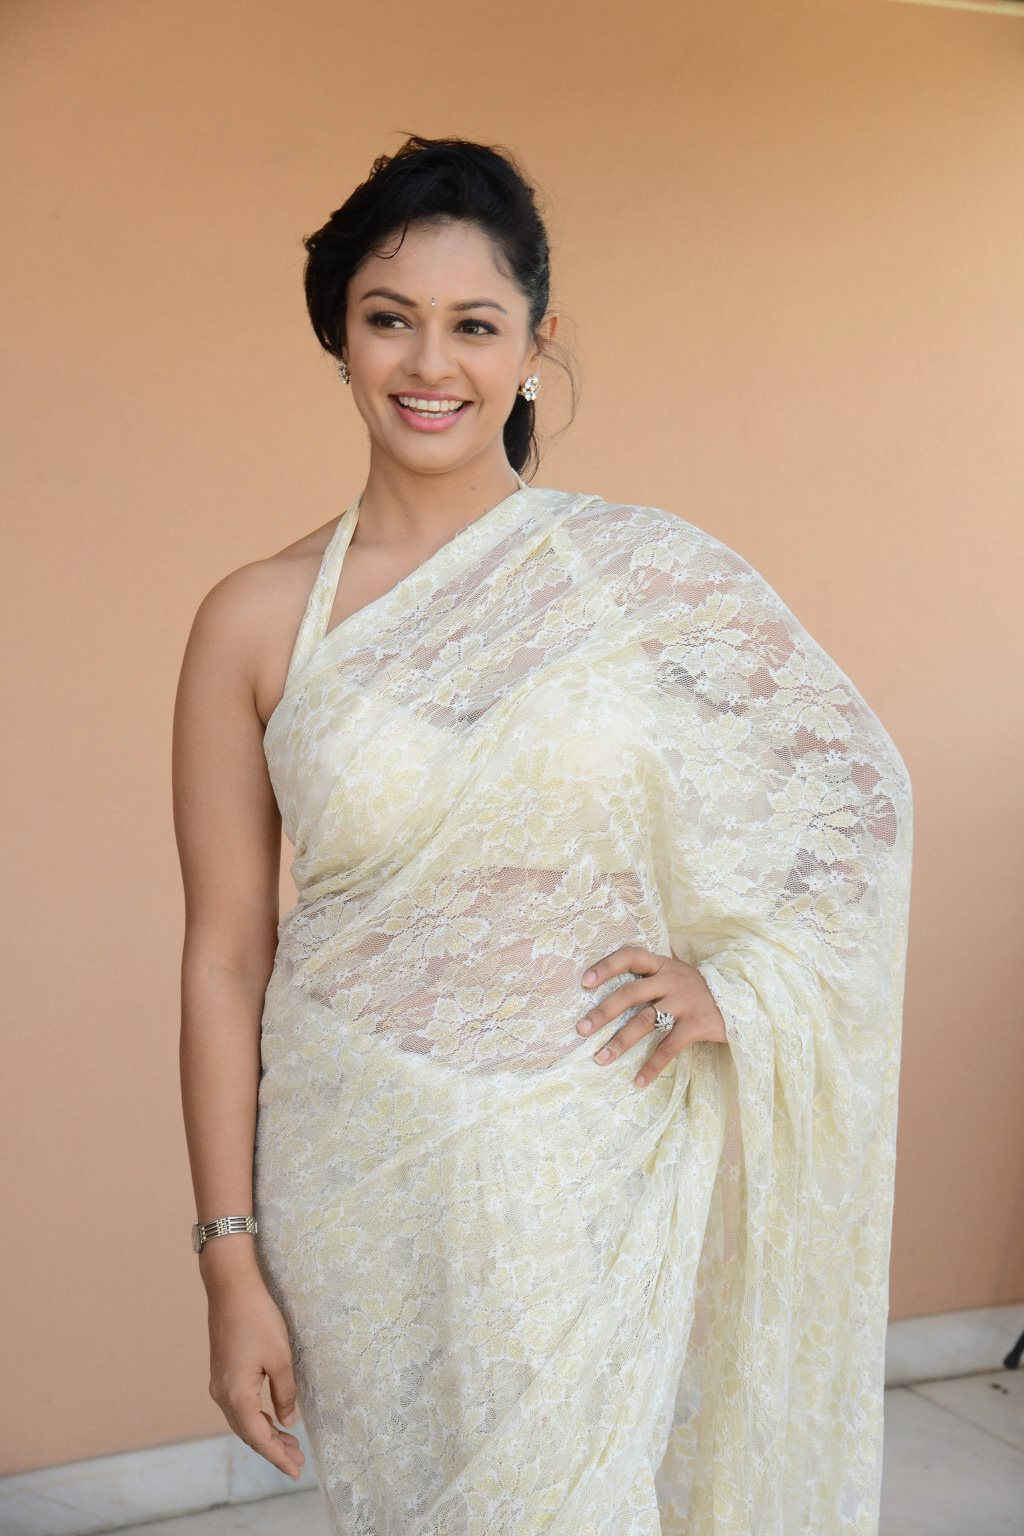 Pooja Kumar Garuda Vega Promotion Stills - Latest Movie Updates, Movie Promotions, Branding -4474